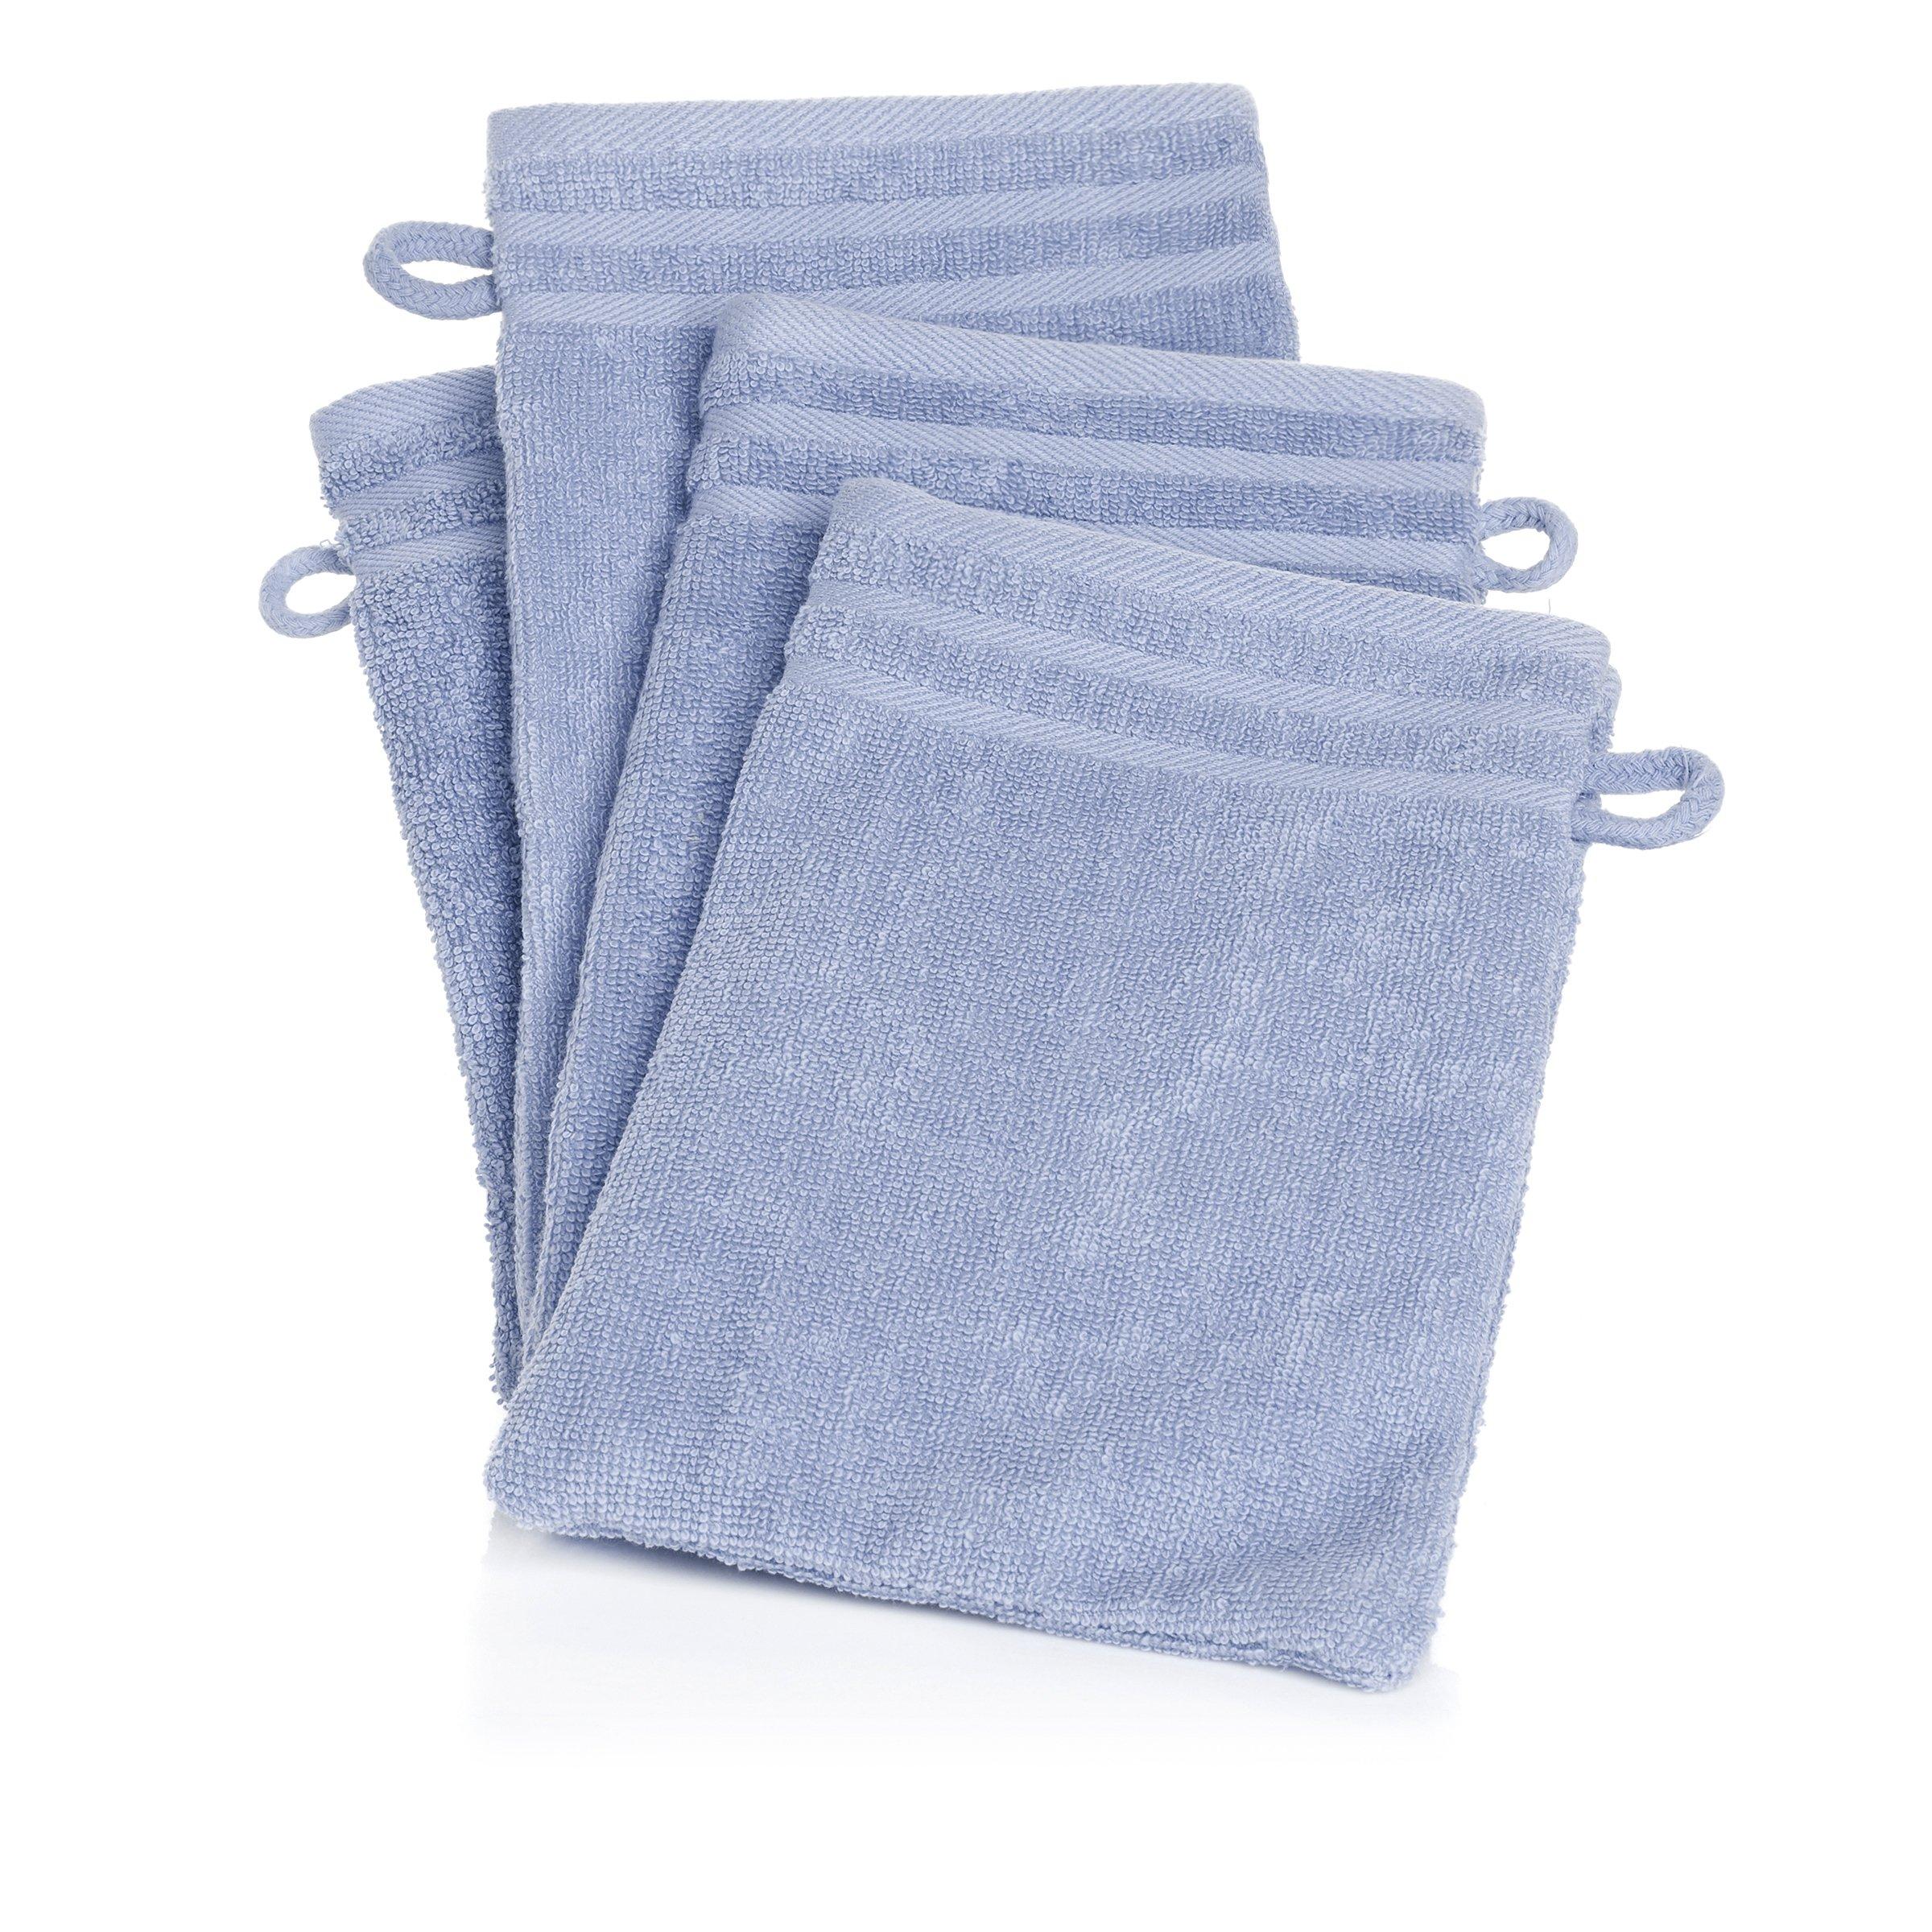 Joy Mangano Supreme Stretch S/4 Mitts SPA Blue Towel Sets, Wash Cloths